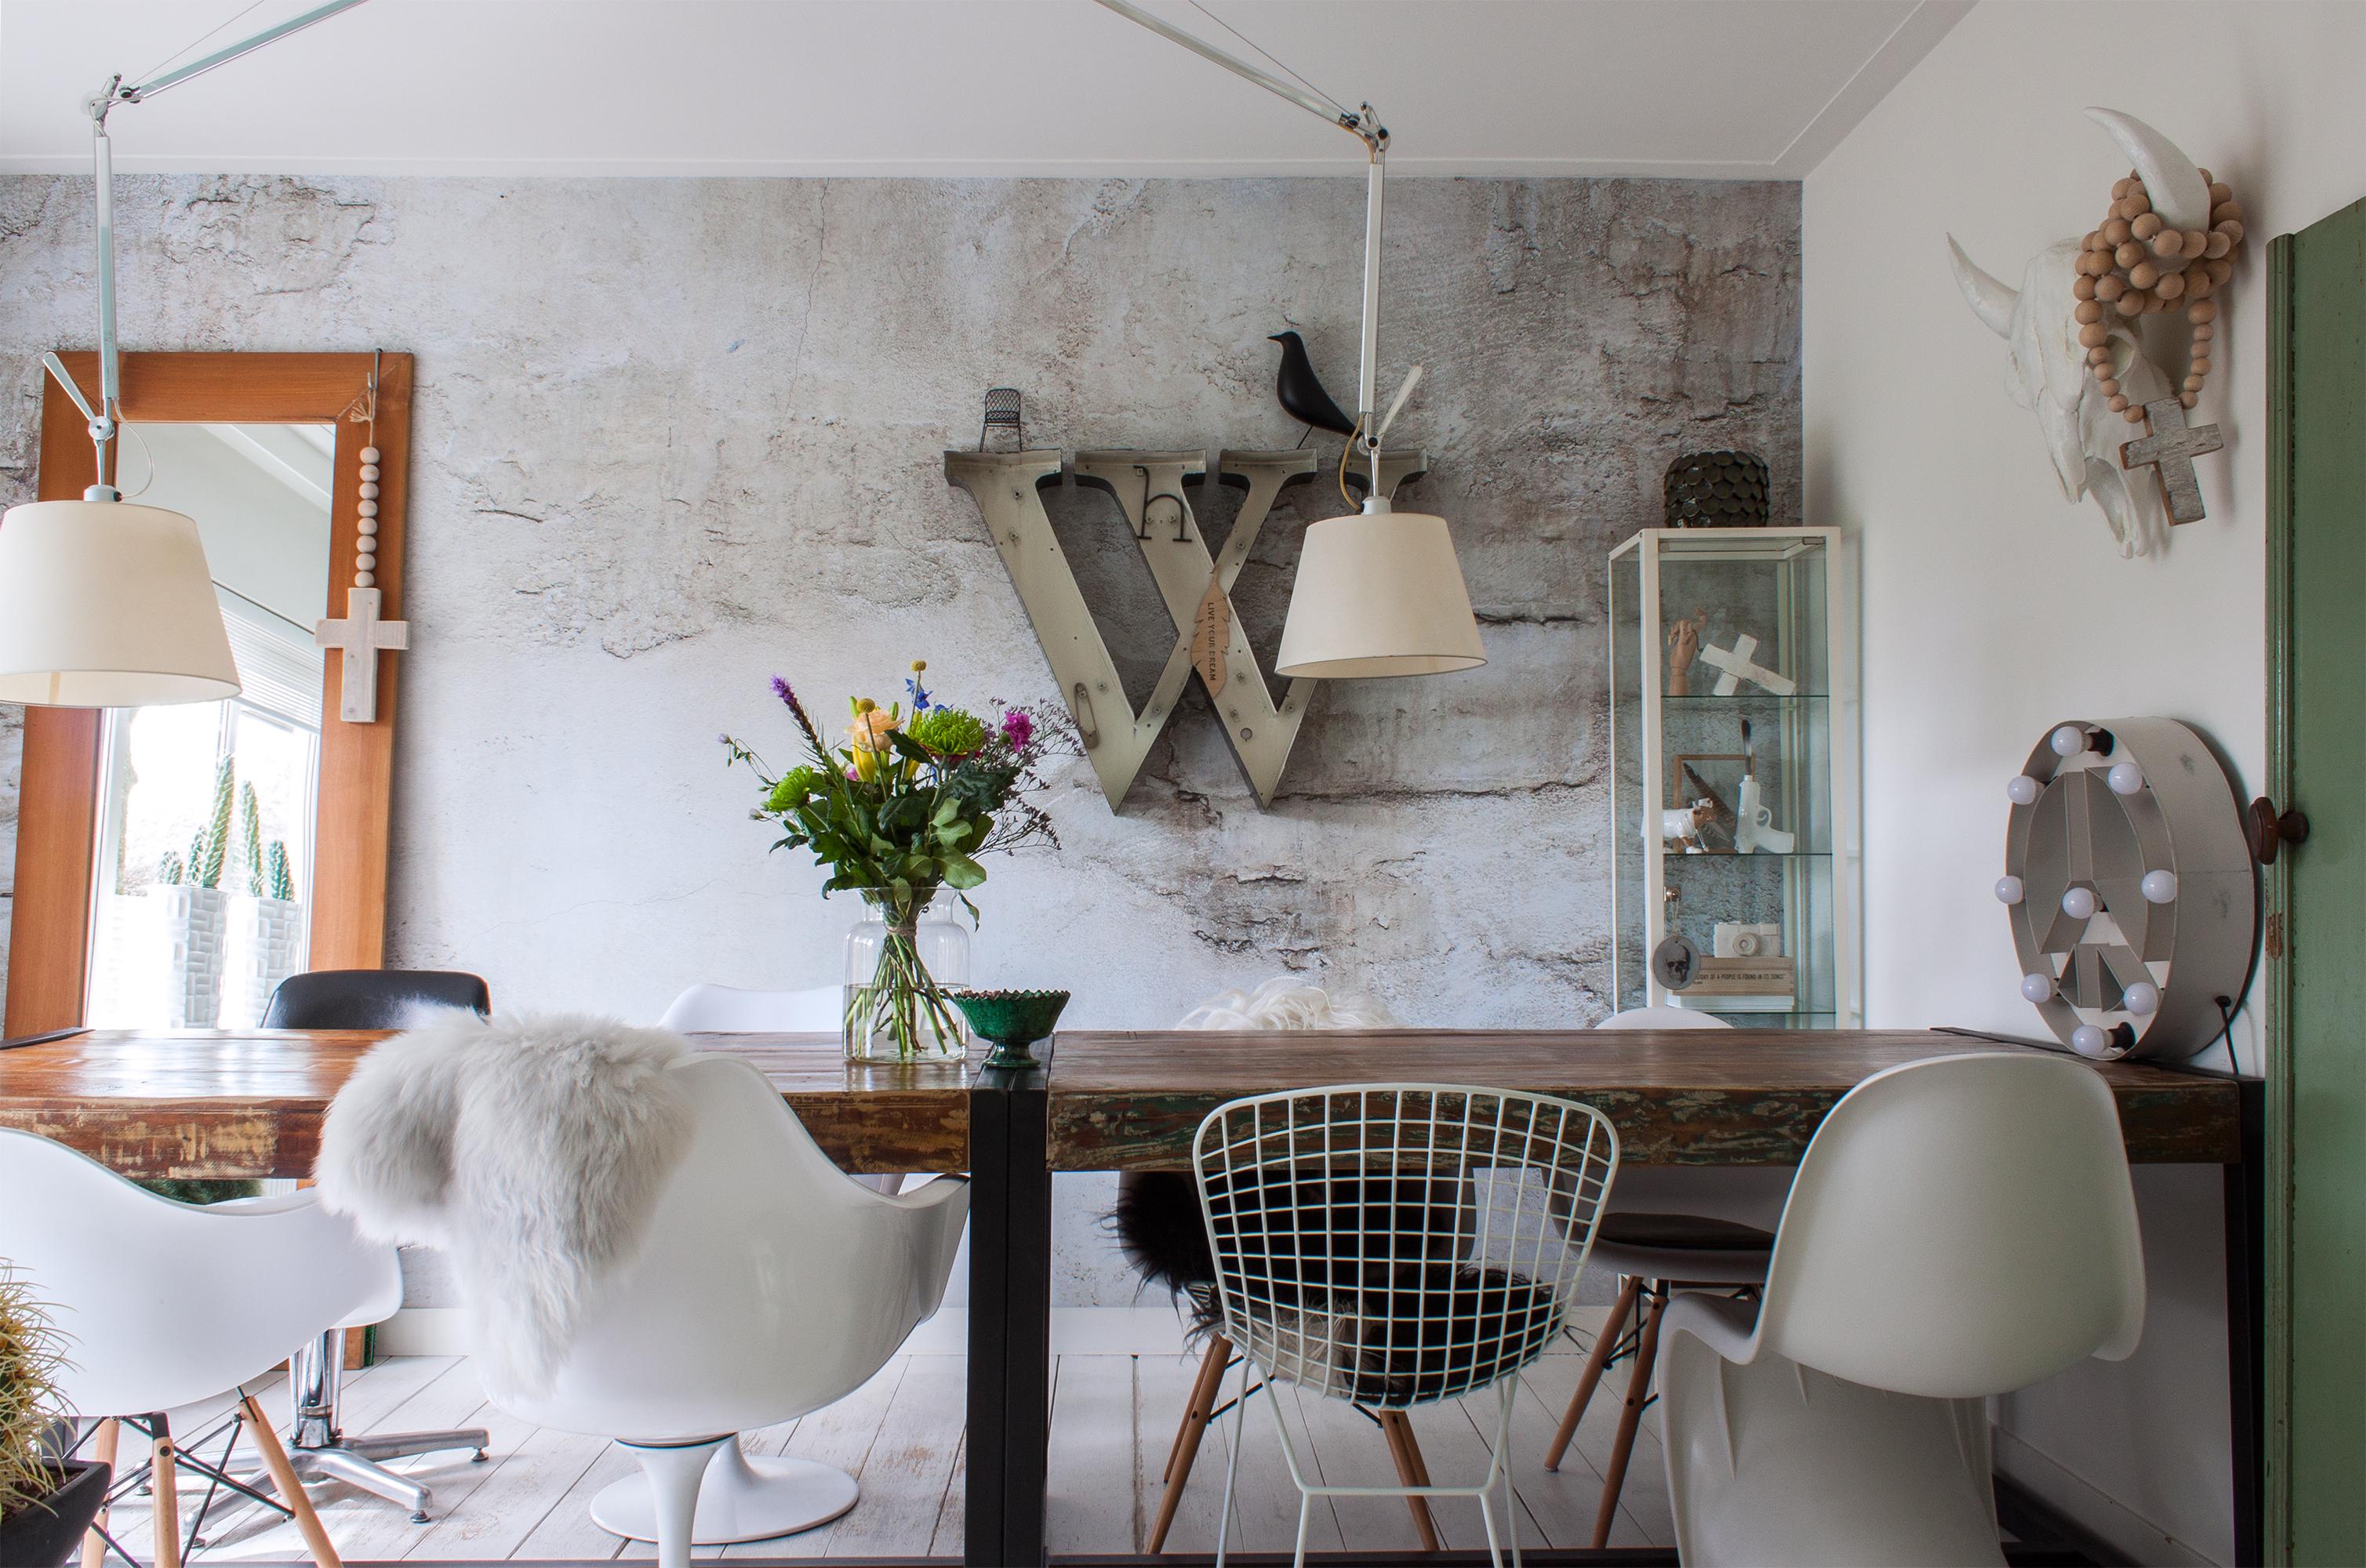 Design Replica Meubels : A dutch design shop owner s stylishly u cstoeru d home apartment therapy